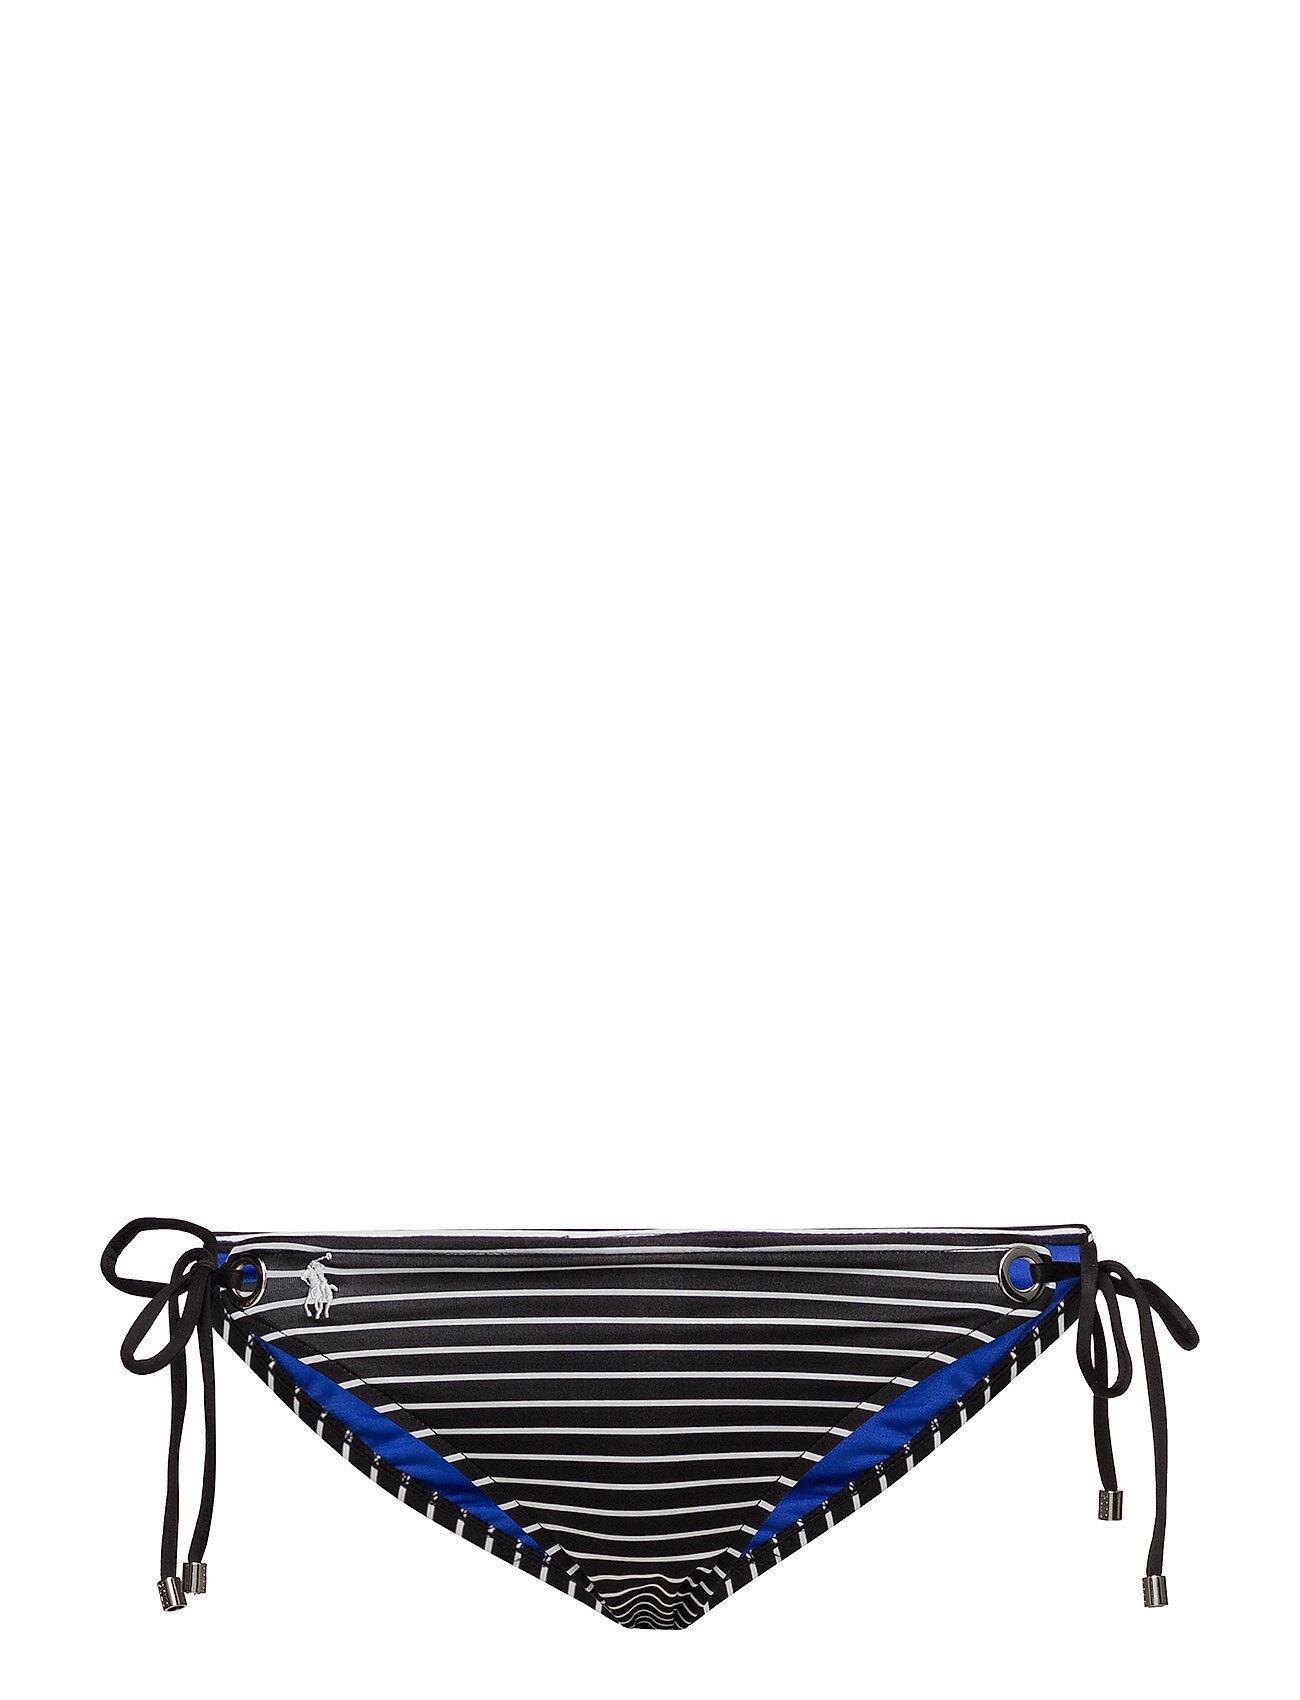 Polo Ralph Lauren Swimwear Resort Stripes Grommet Side Tie Bottom